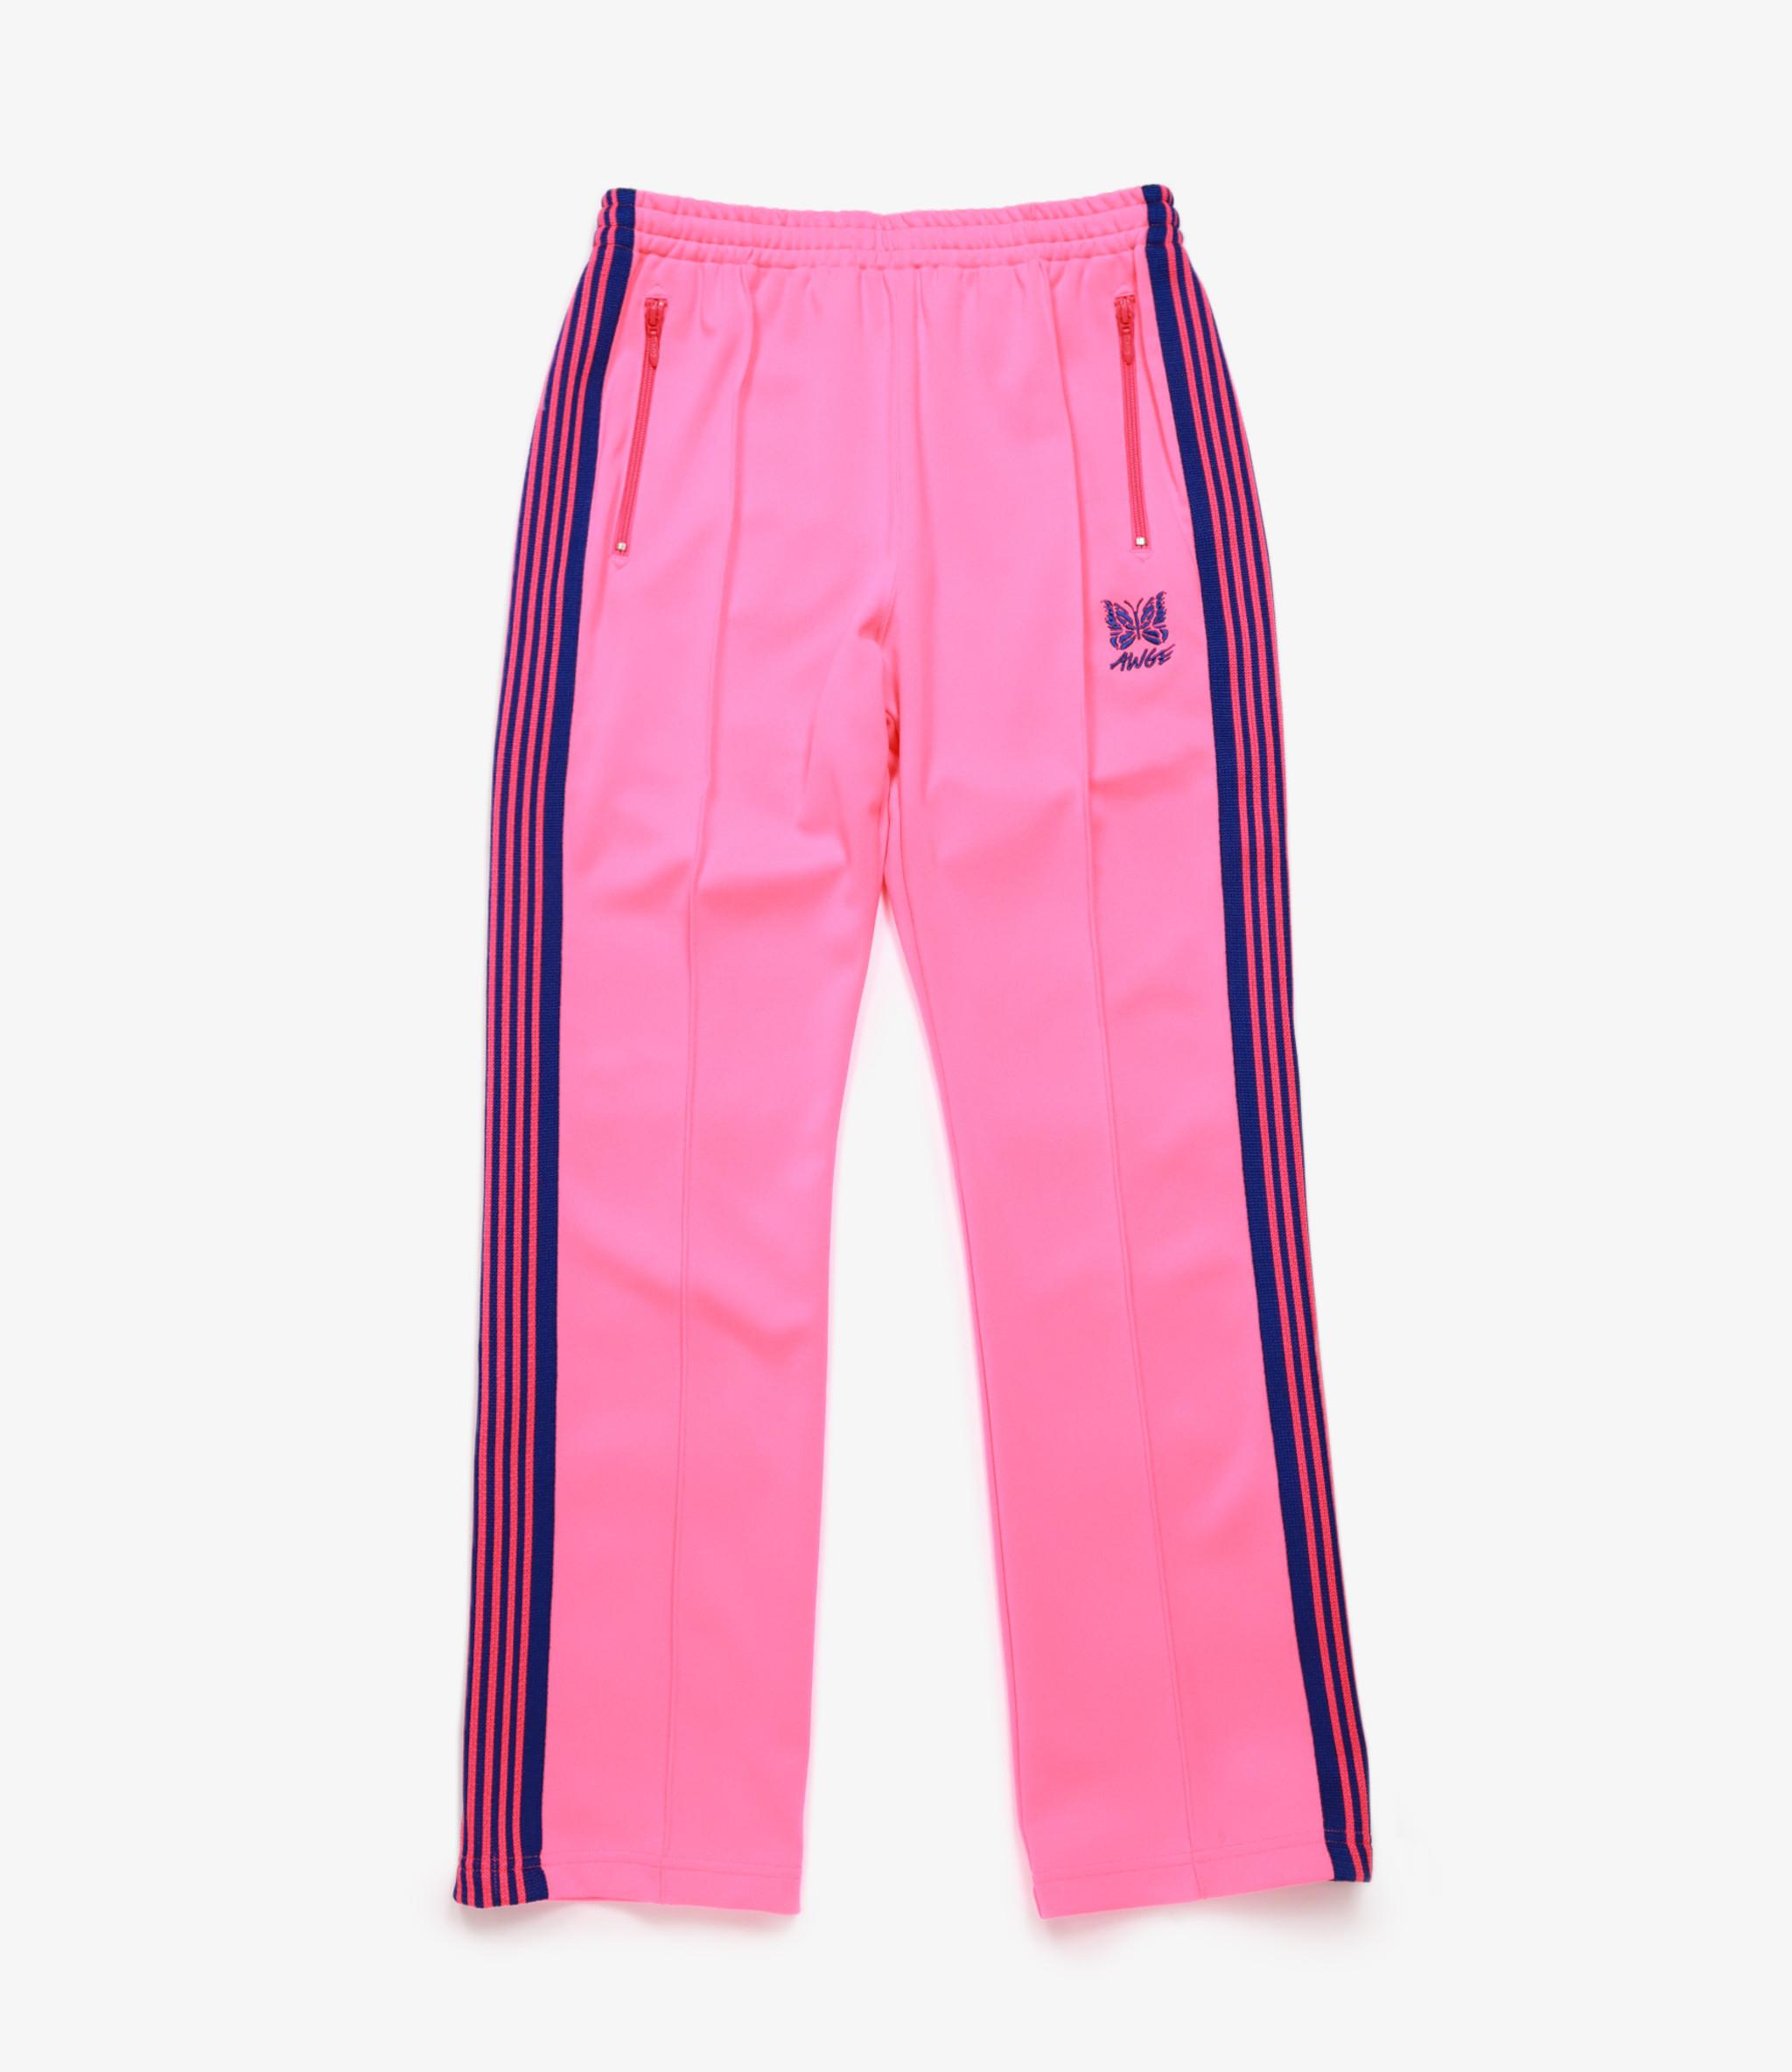 Needles Needles x AWGE: Narrow Track Pant - Poly Smooth - Neon Pink